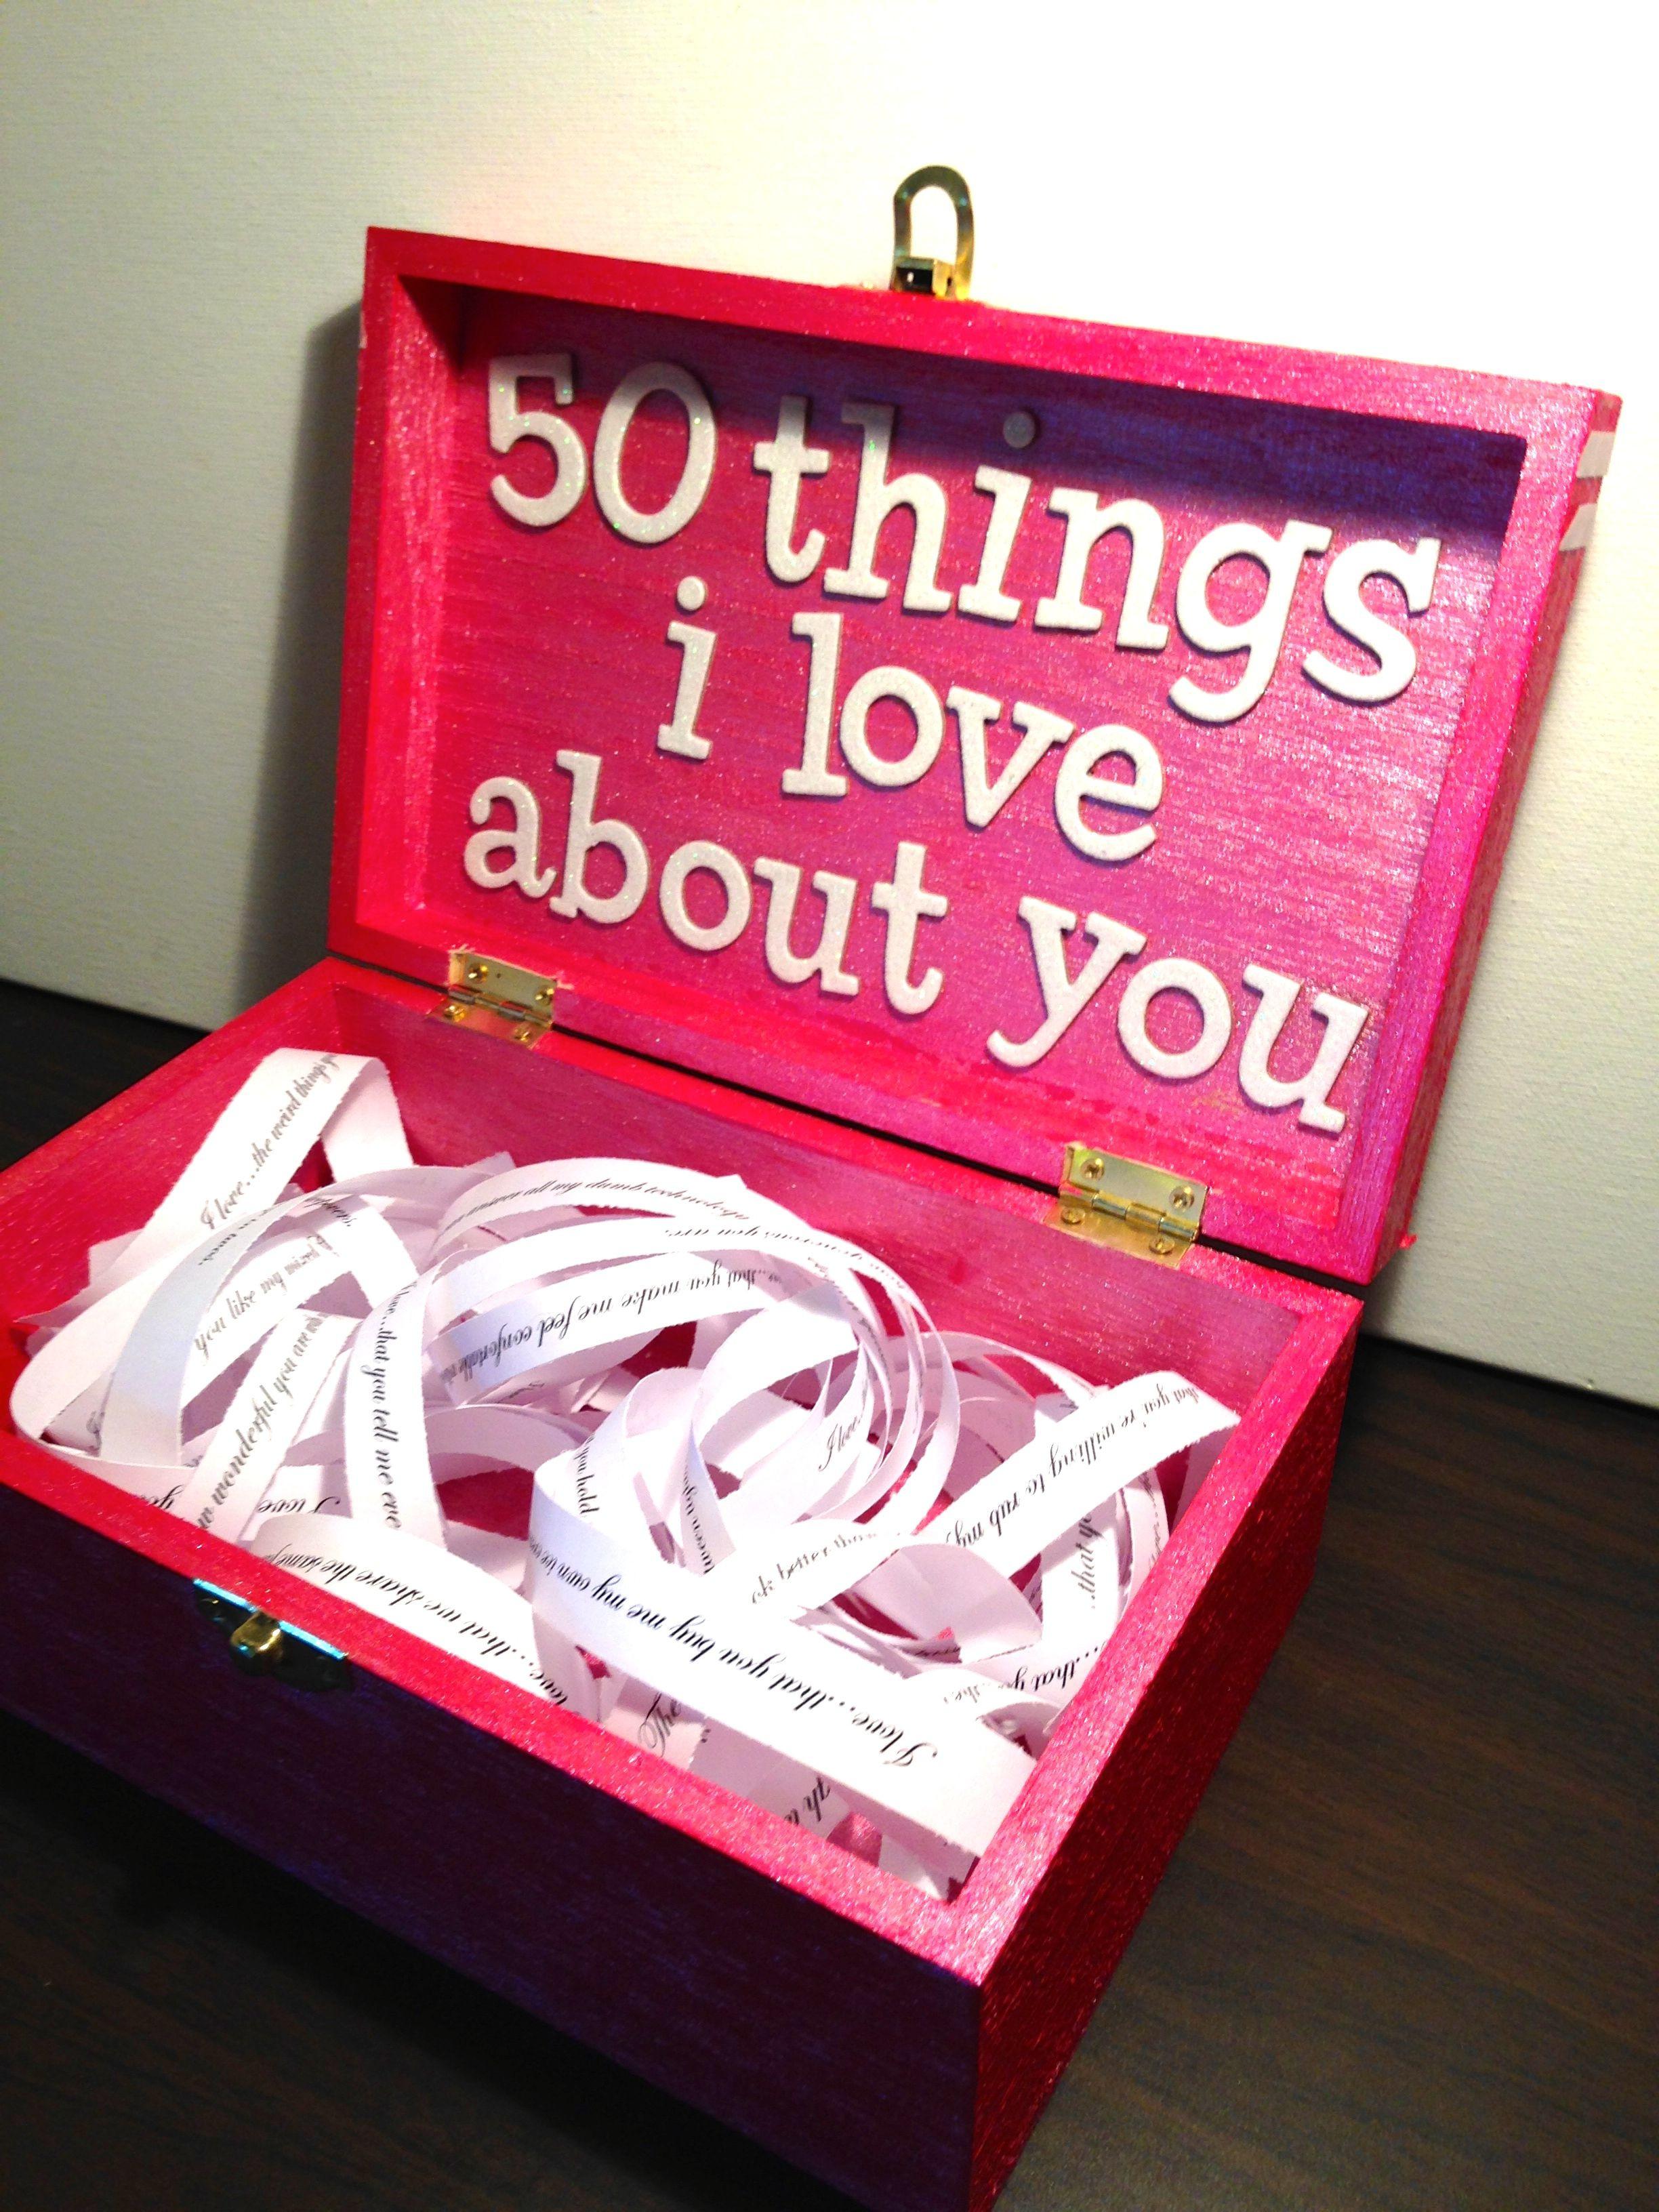 Best ideas about Cute Birthday Gift Ideas For Girlfriend . Save or Pin Boyfriend Girlfriend t ideas for birthday valentine Now.